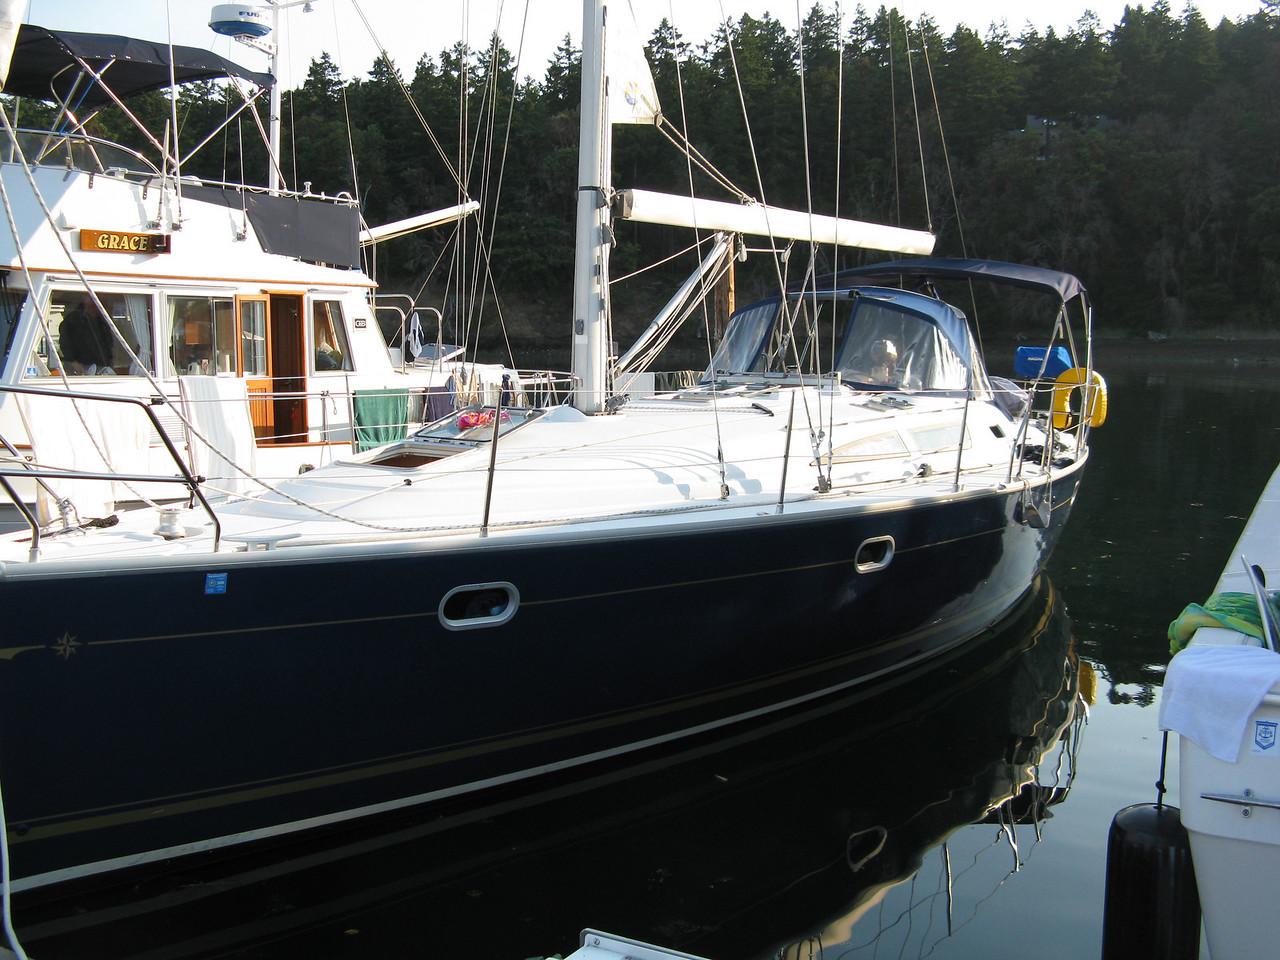 09 07 26-08 02 Sail SJ 202